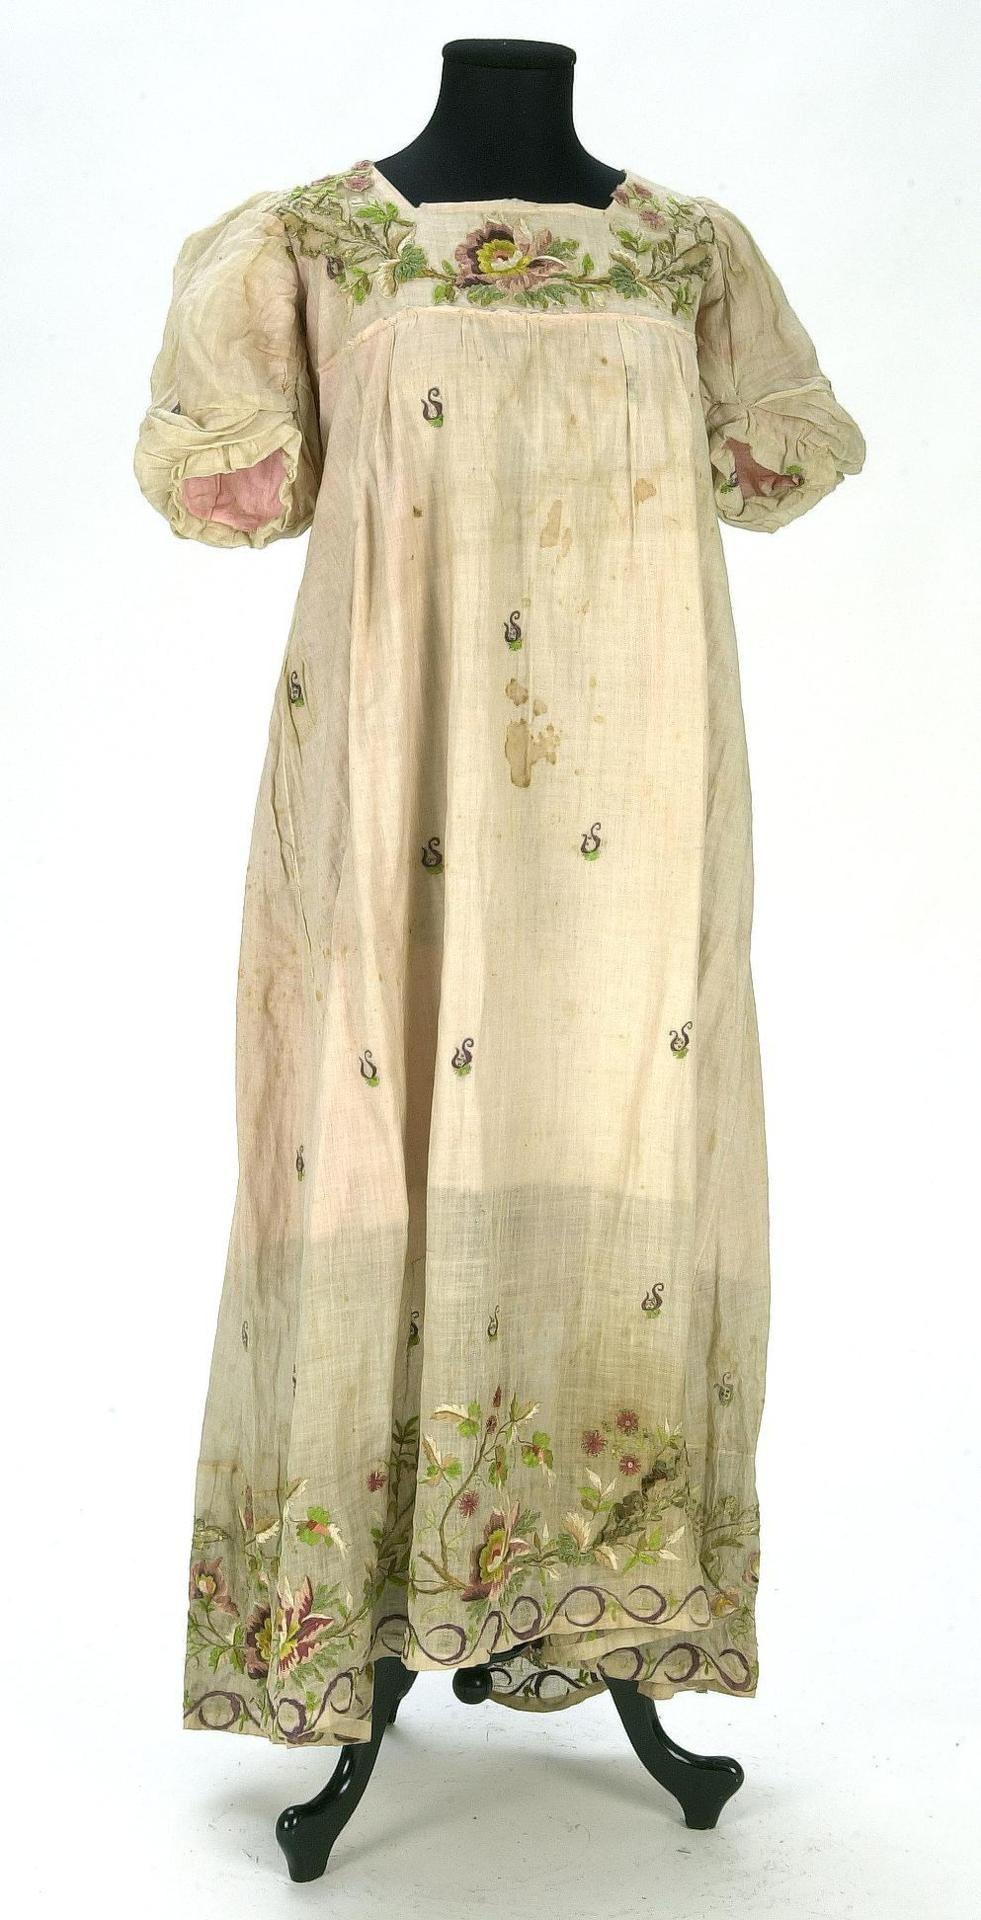 Dress 1800s IMATEX | O F F T H E R A C K | Pinterest | Regency ...